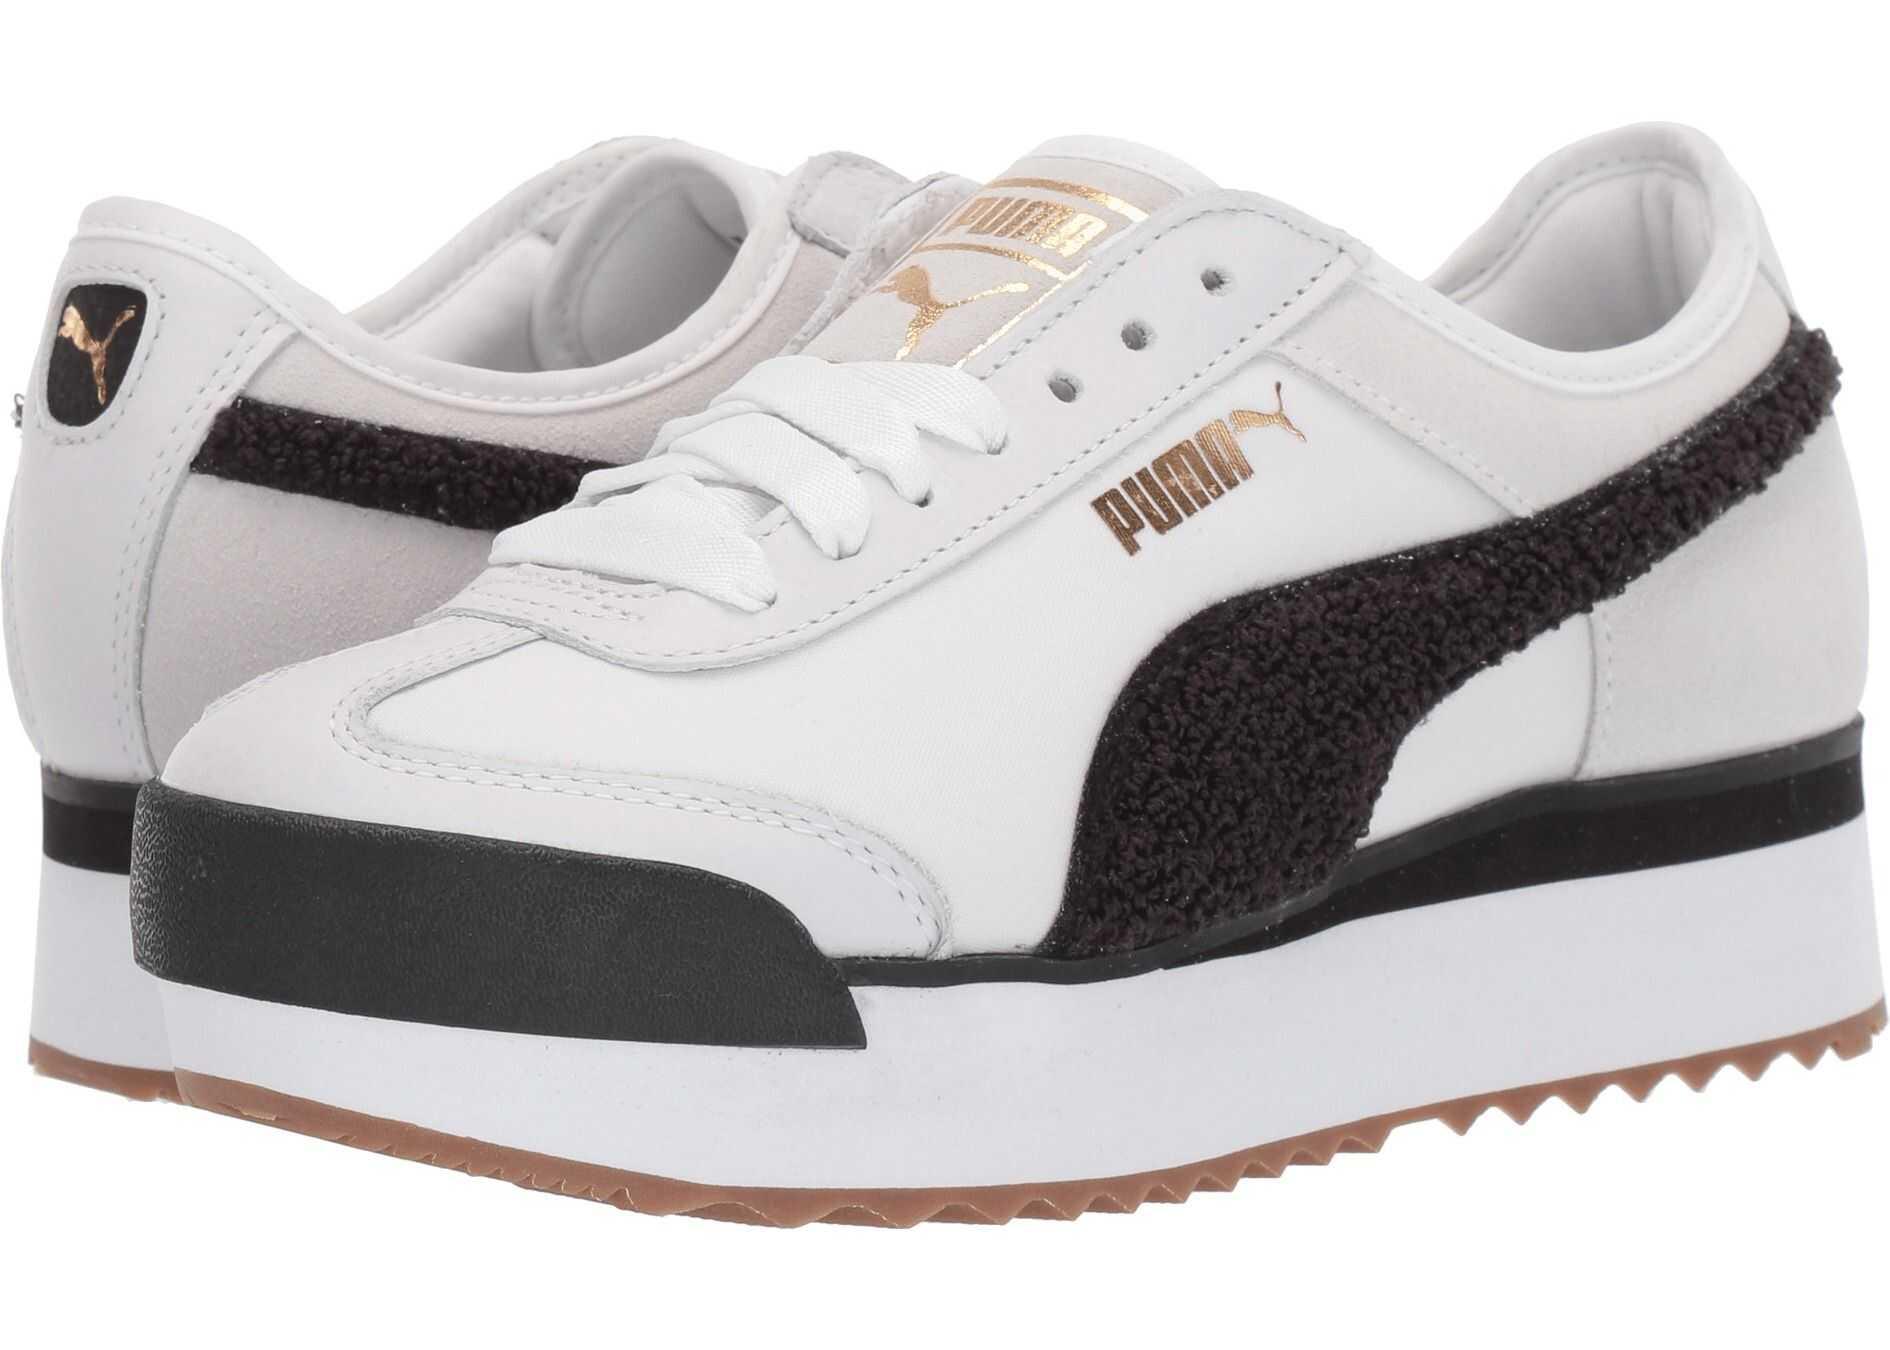 PUMA Roma Amor Heritage Puma White/Puma Black